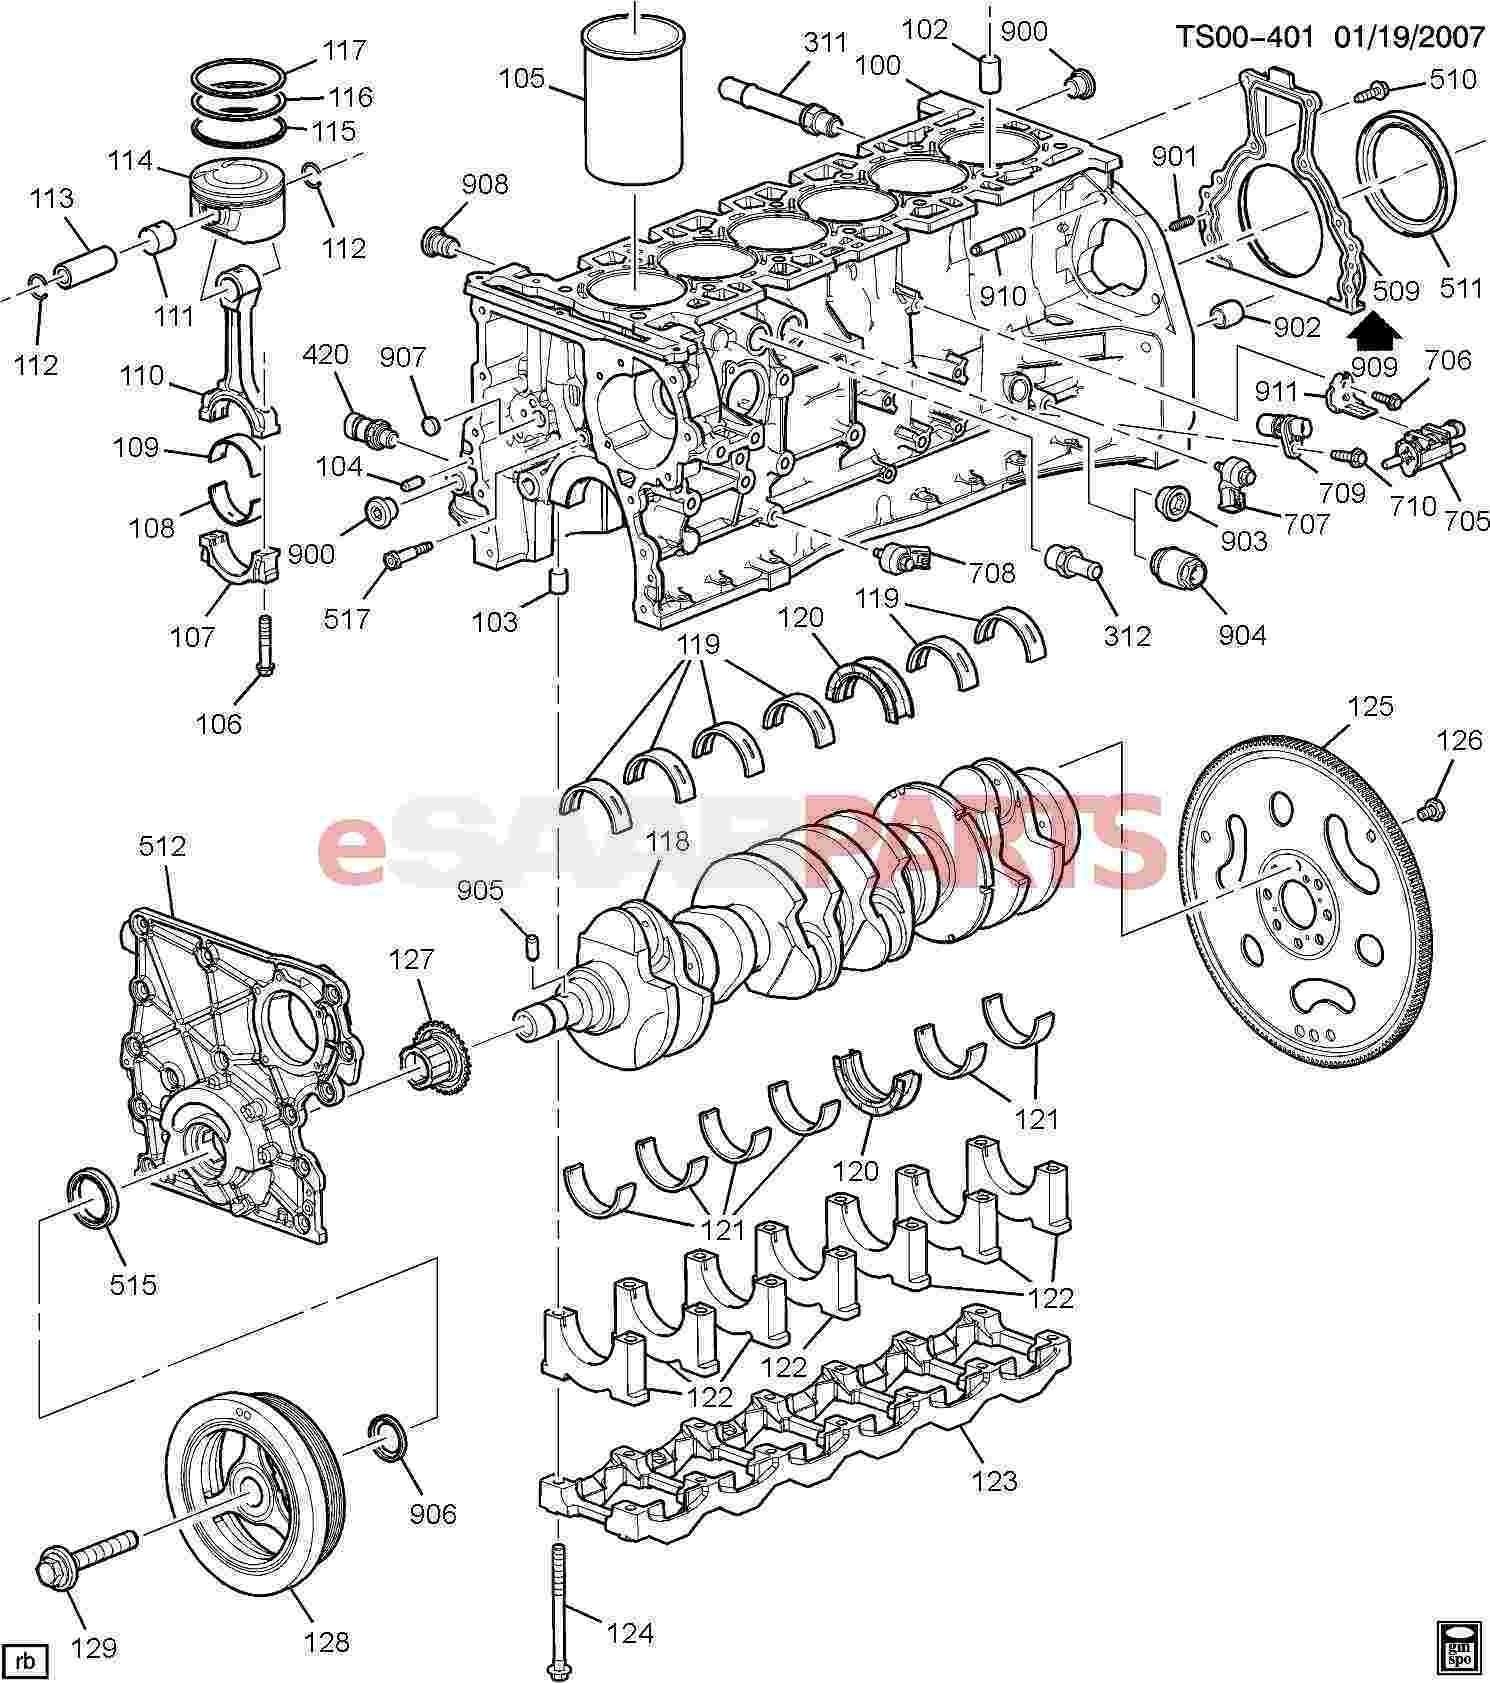 Engine Block Parts Diagram Auto Engine Parts Diagram Gas